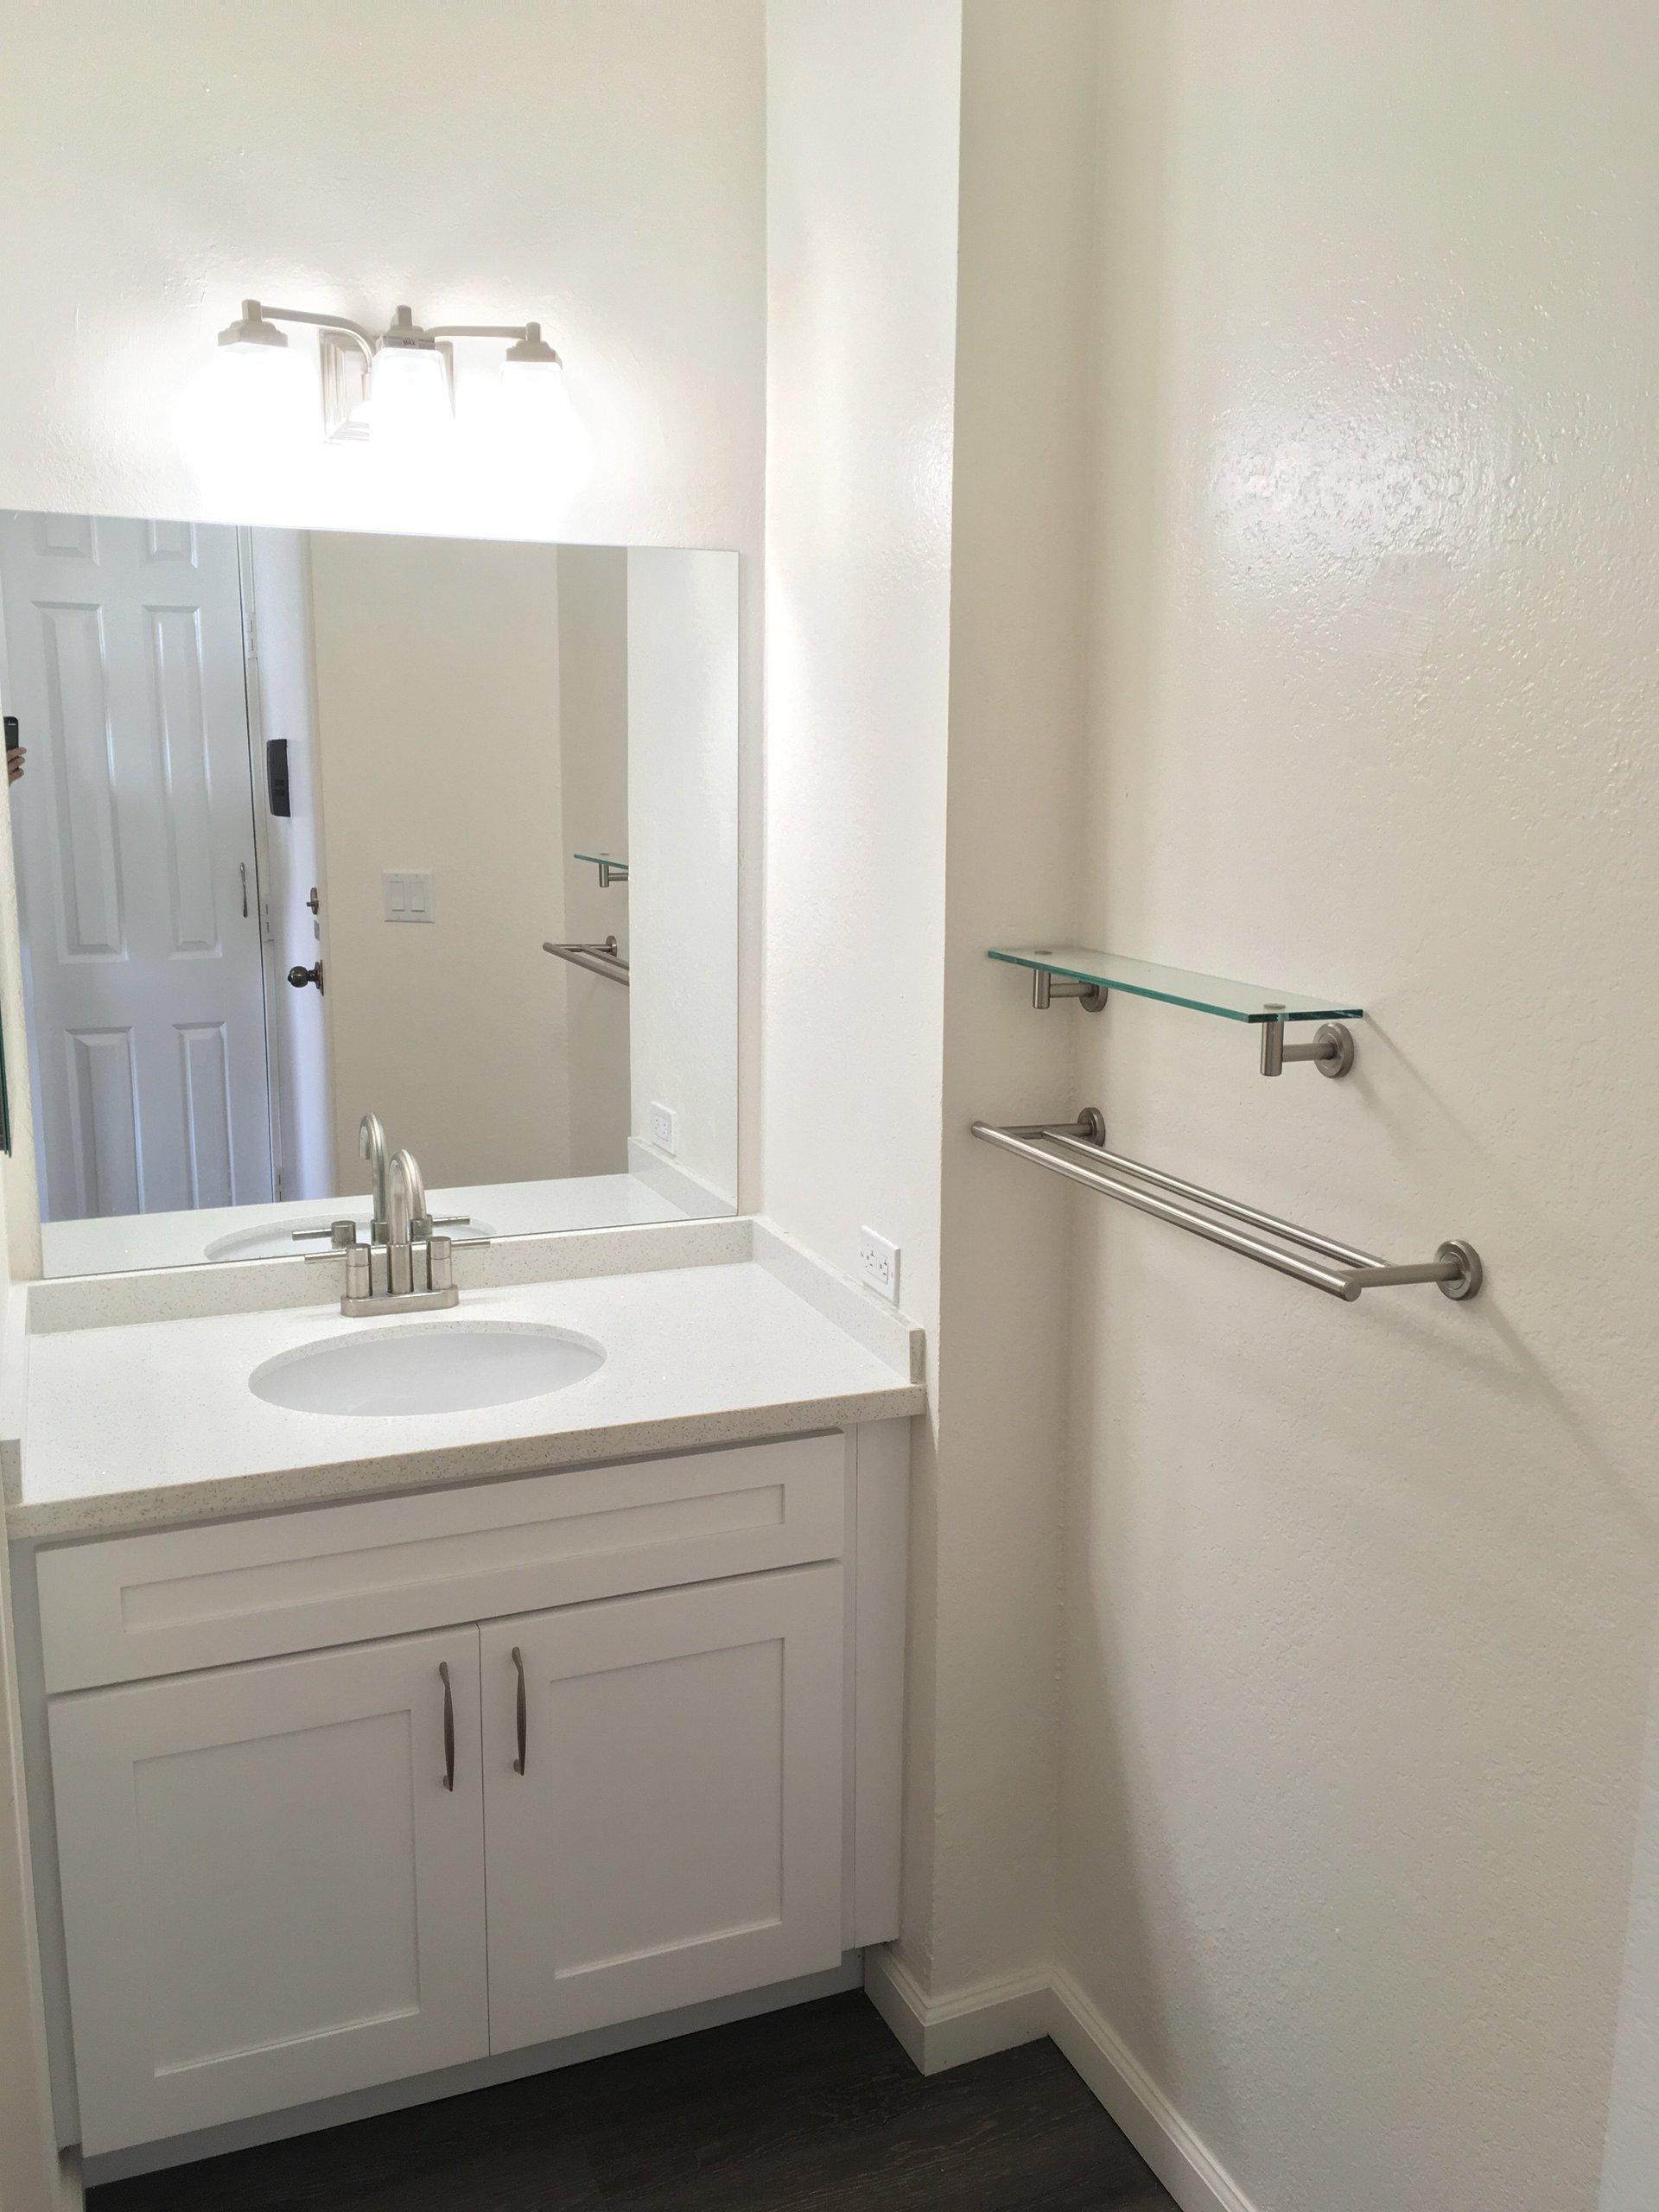 Bathroom Renovation Hawaii 3 factors to consider before beginning your bathroom remodeling